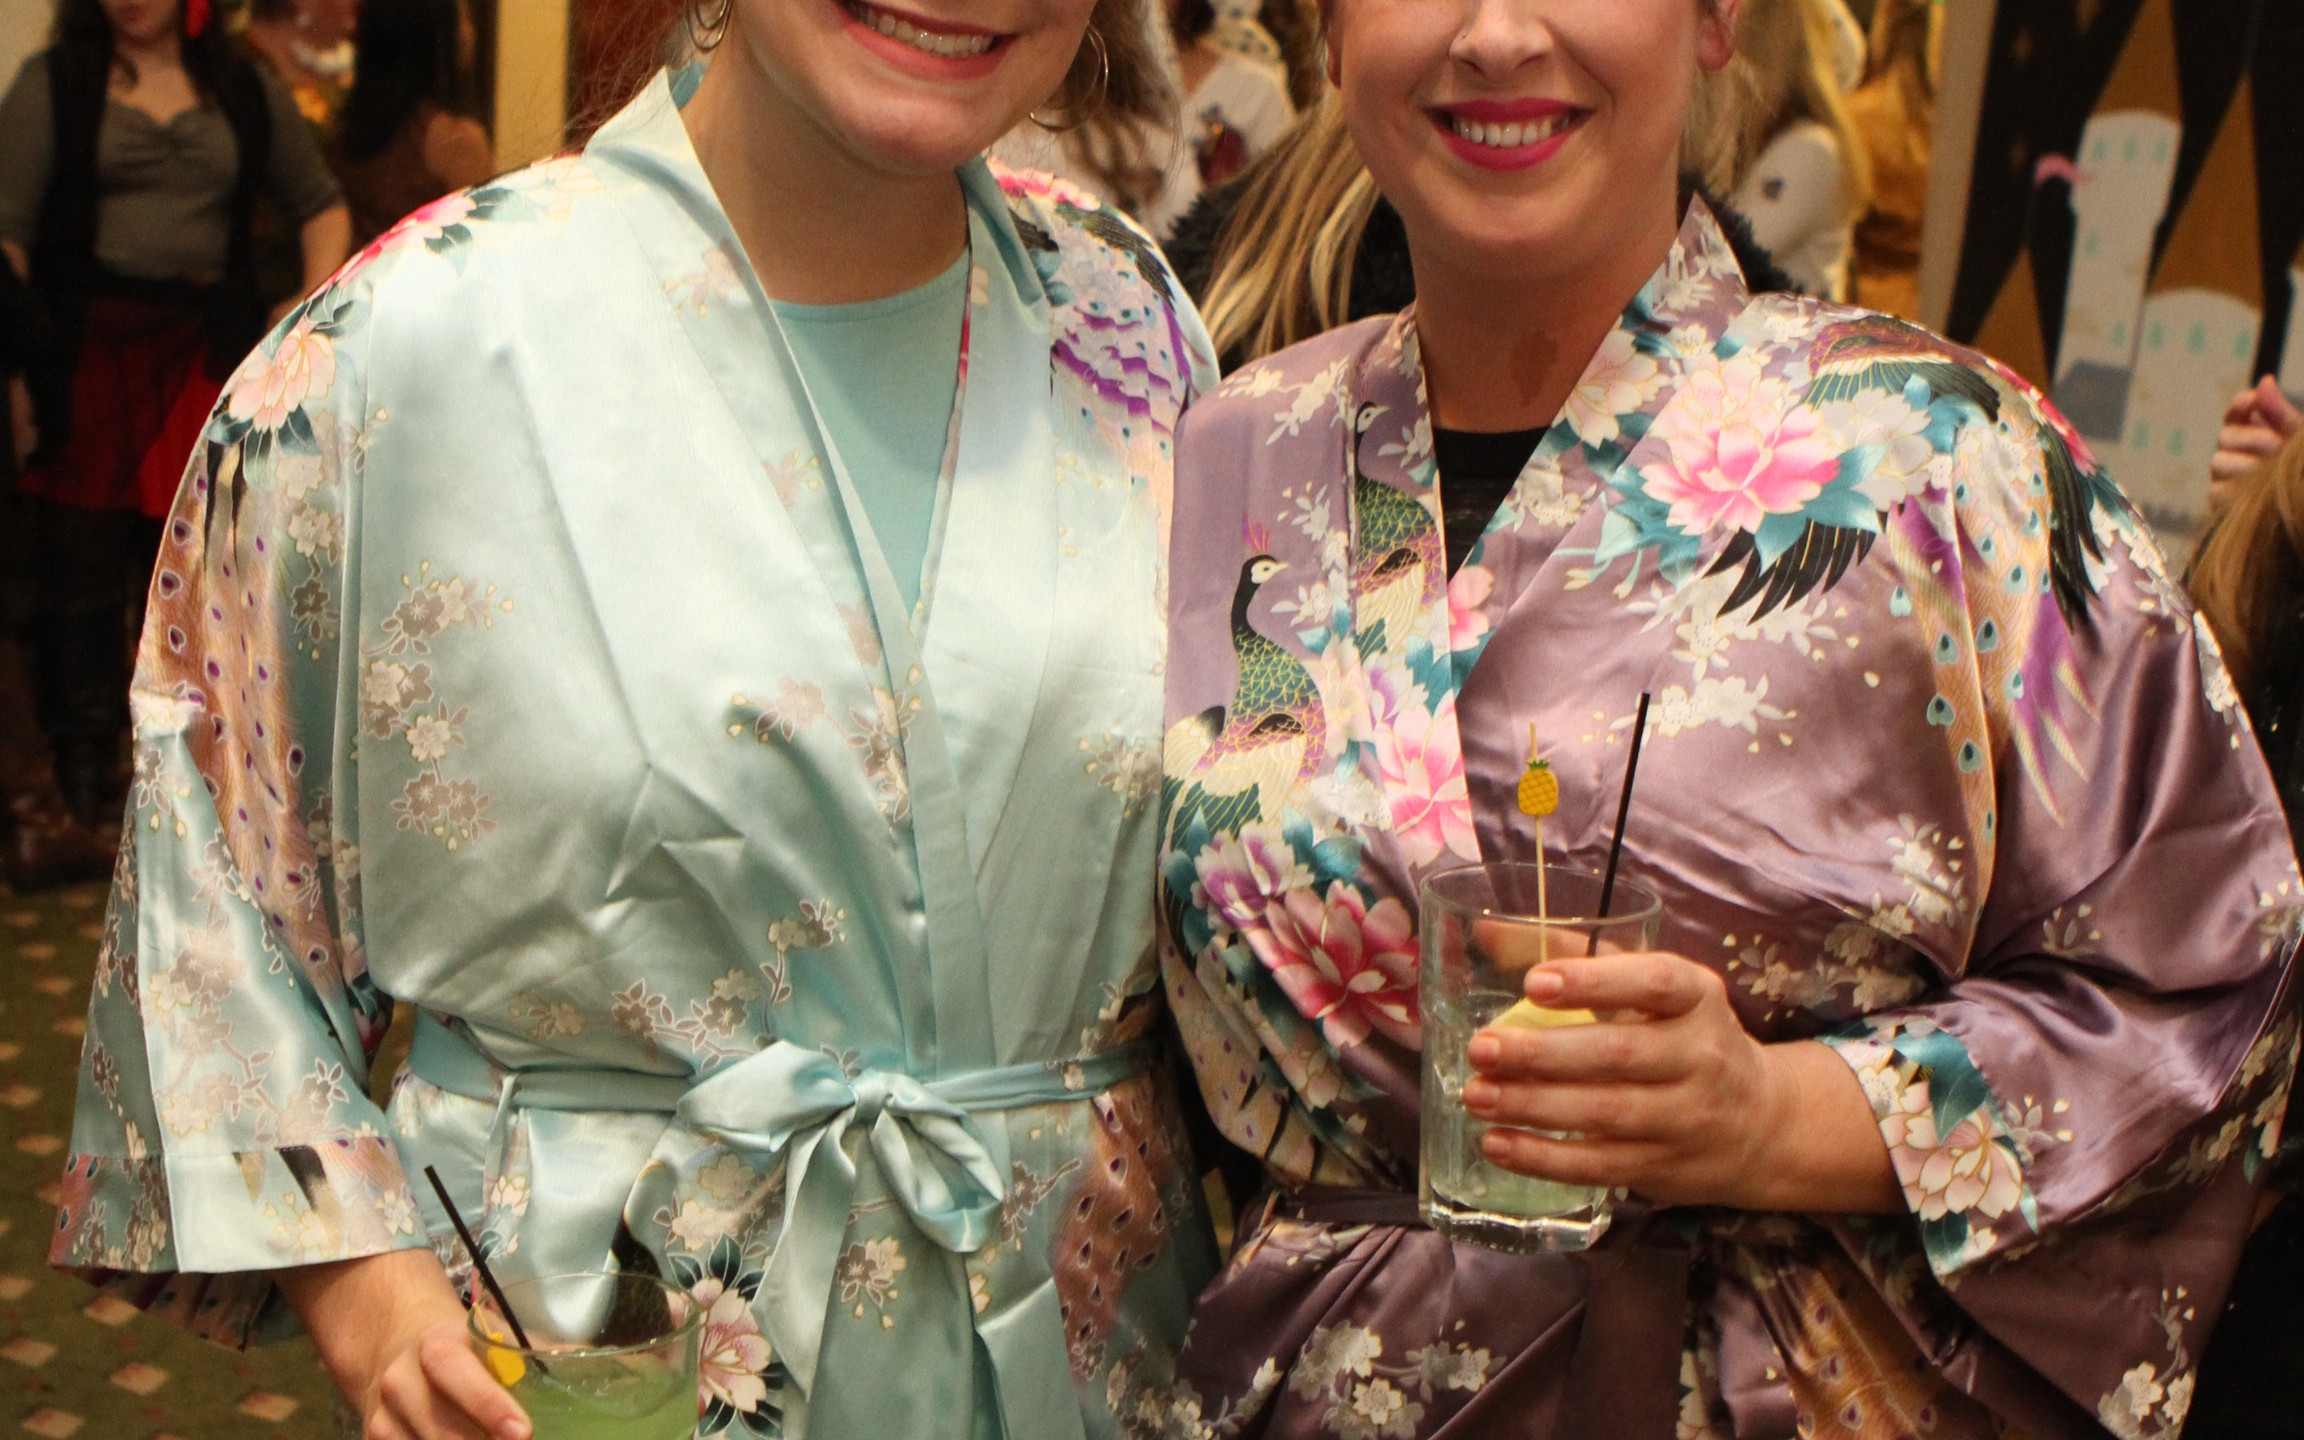 Haley Brunick, Kayla Wigley